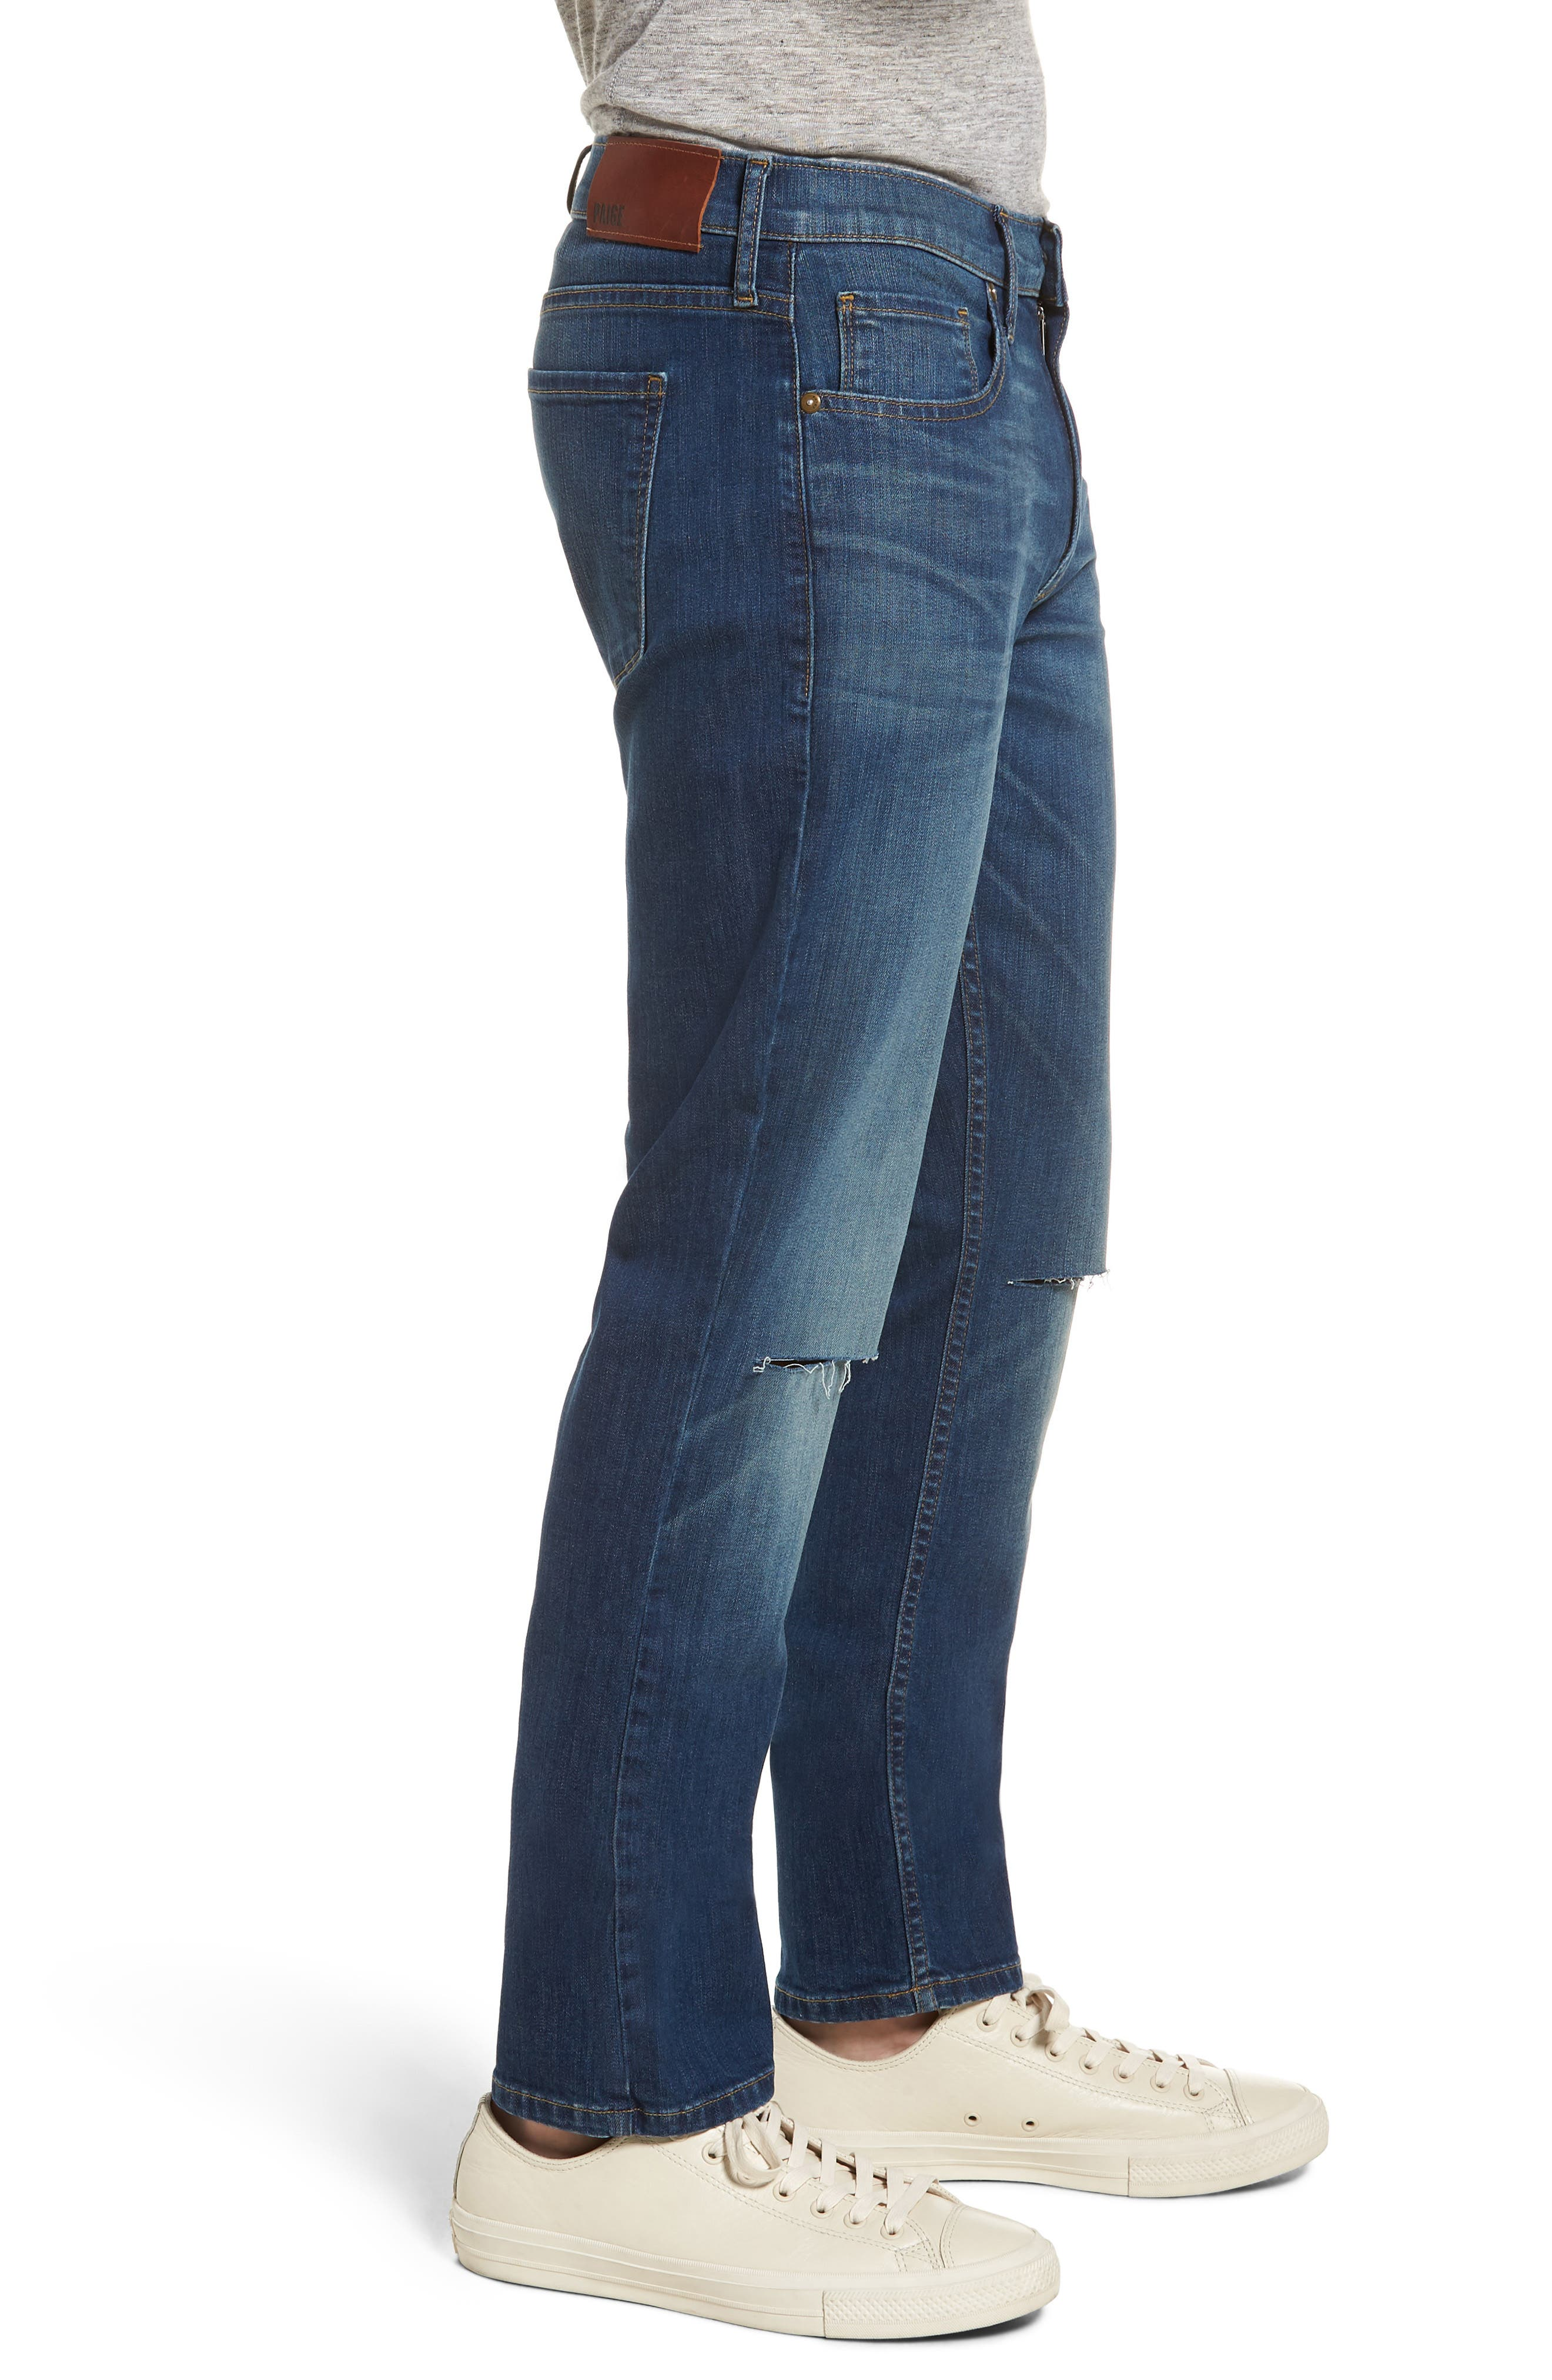 Lennox Slim Fit Jeans,                             Alternate thumbnail 3, color,                             Harlan Destructed